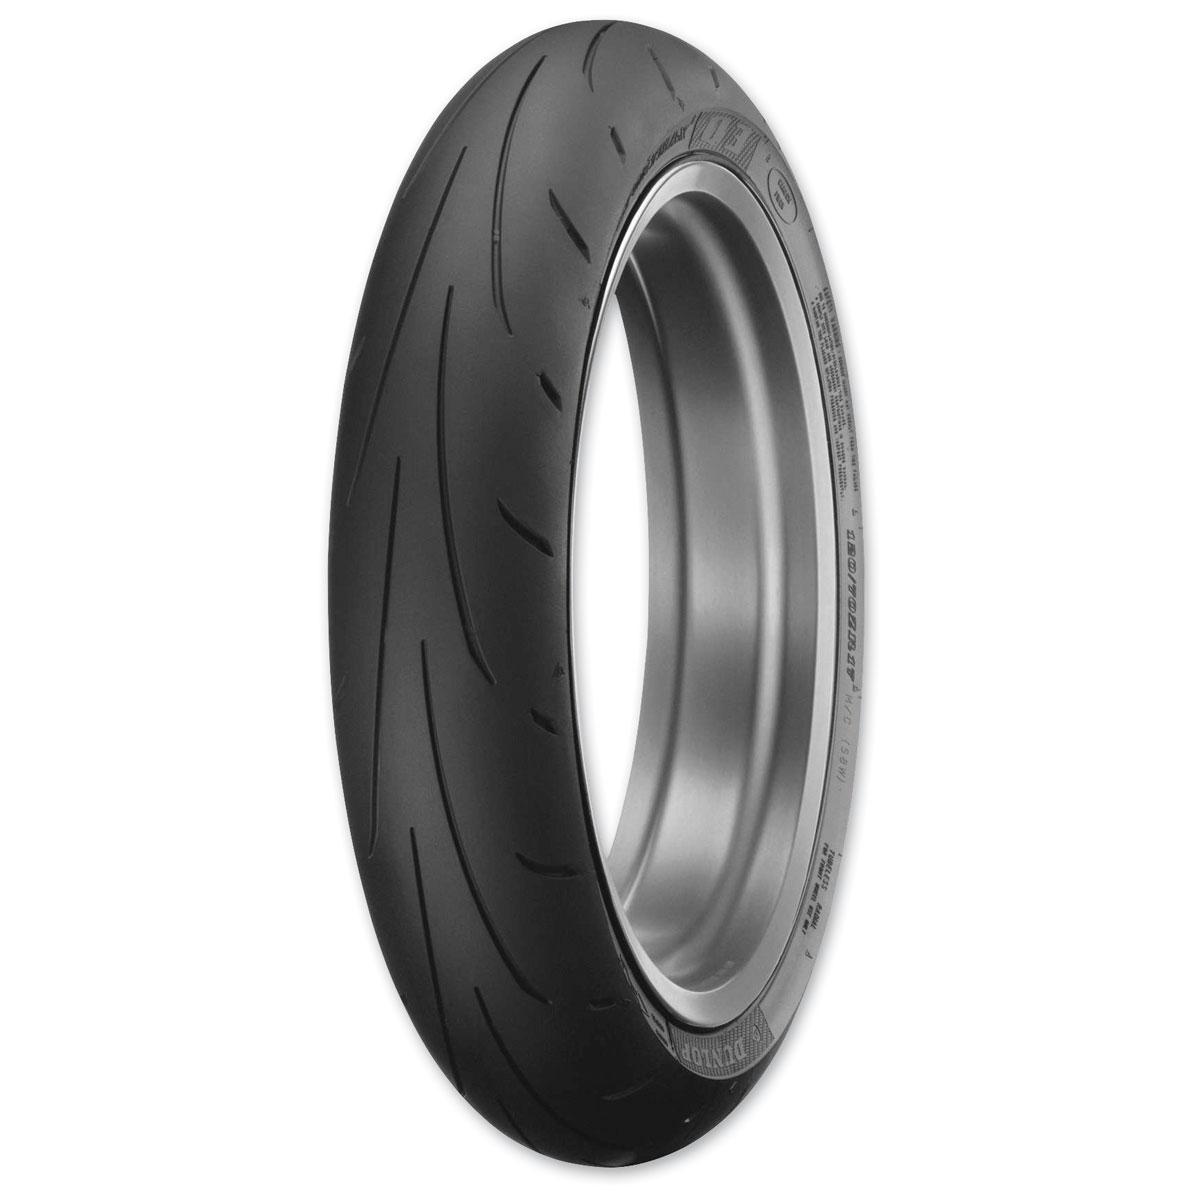 Dunlop Sportmax Q3+ Front Tires